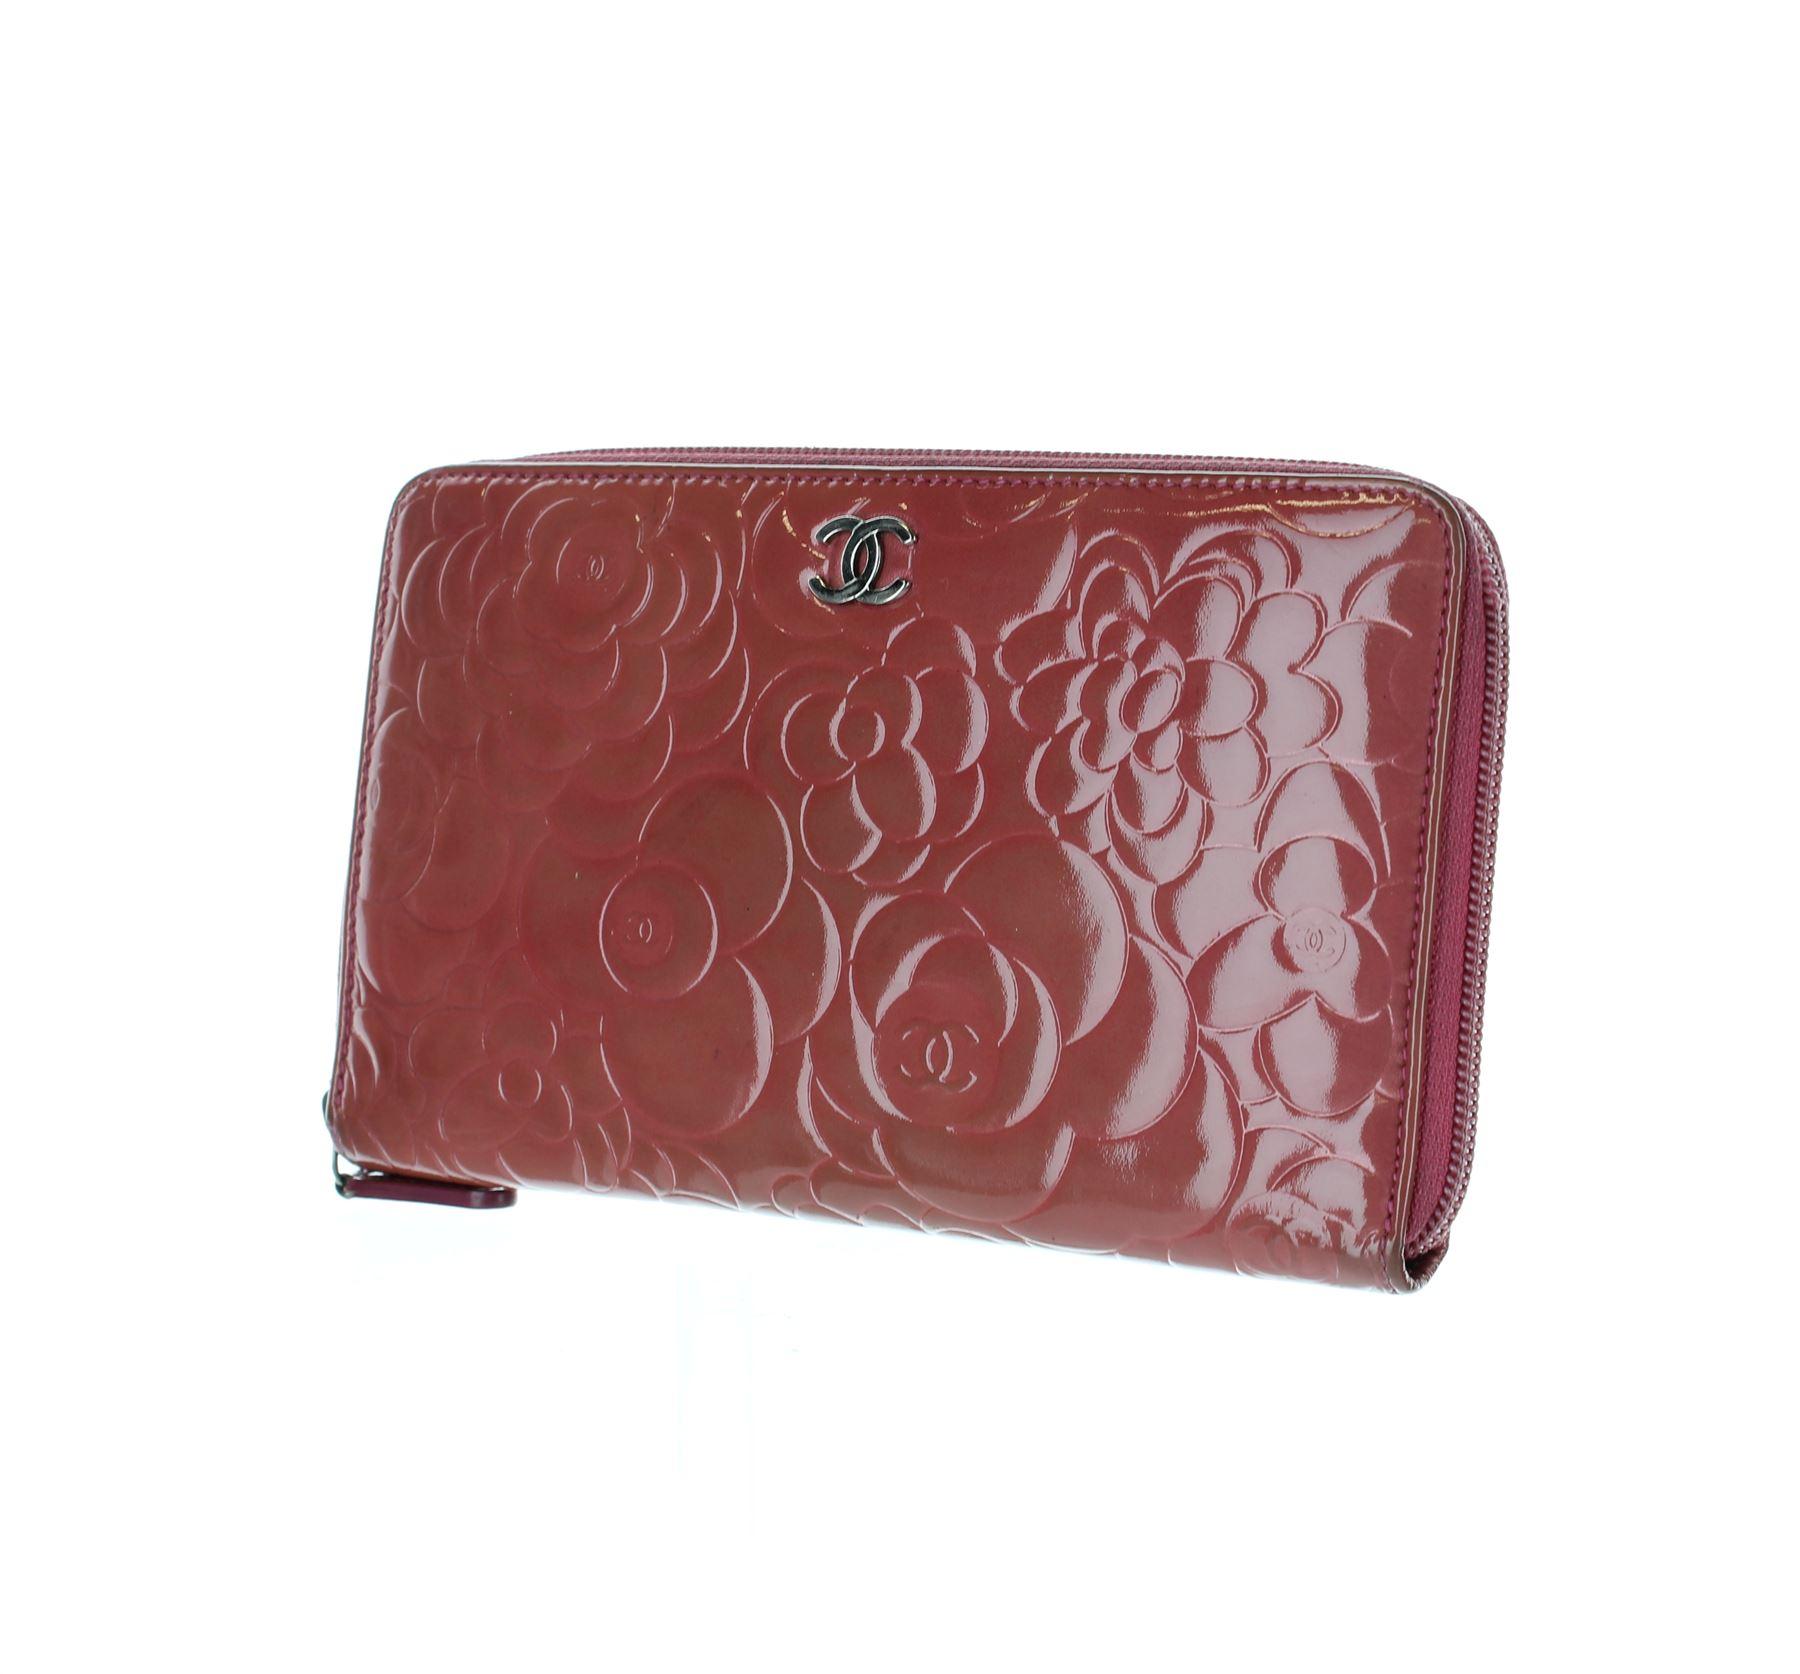 0c7a83754b CHANEL Camelia Porte-monnaie / sac à main rose en cuir verni, 5